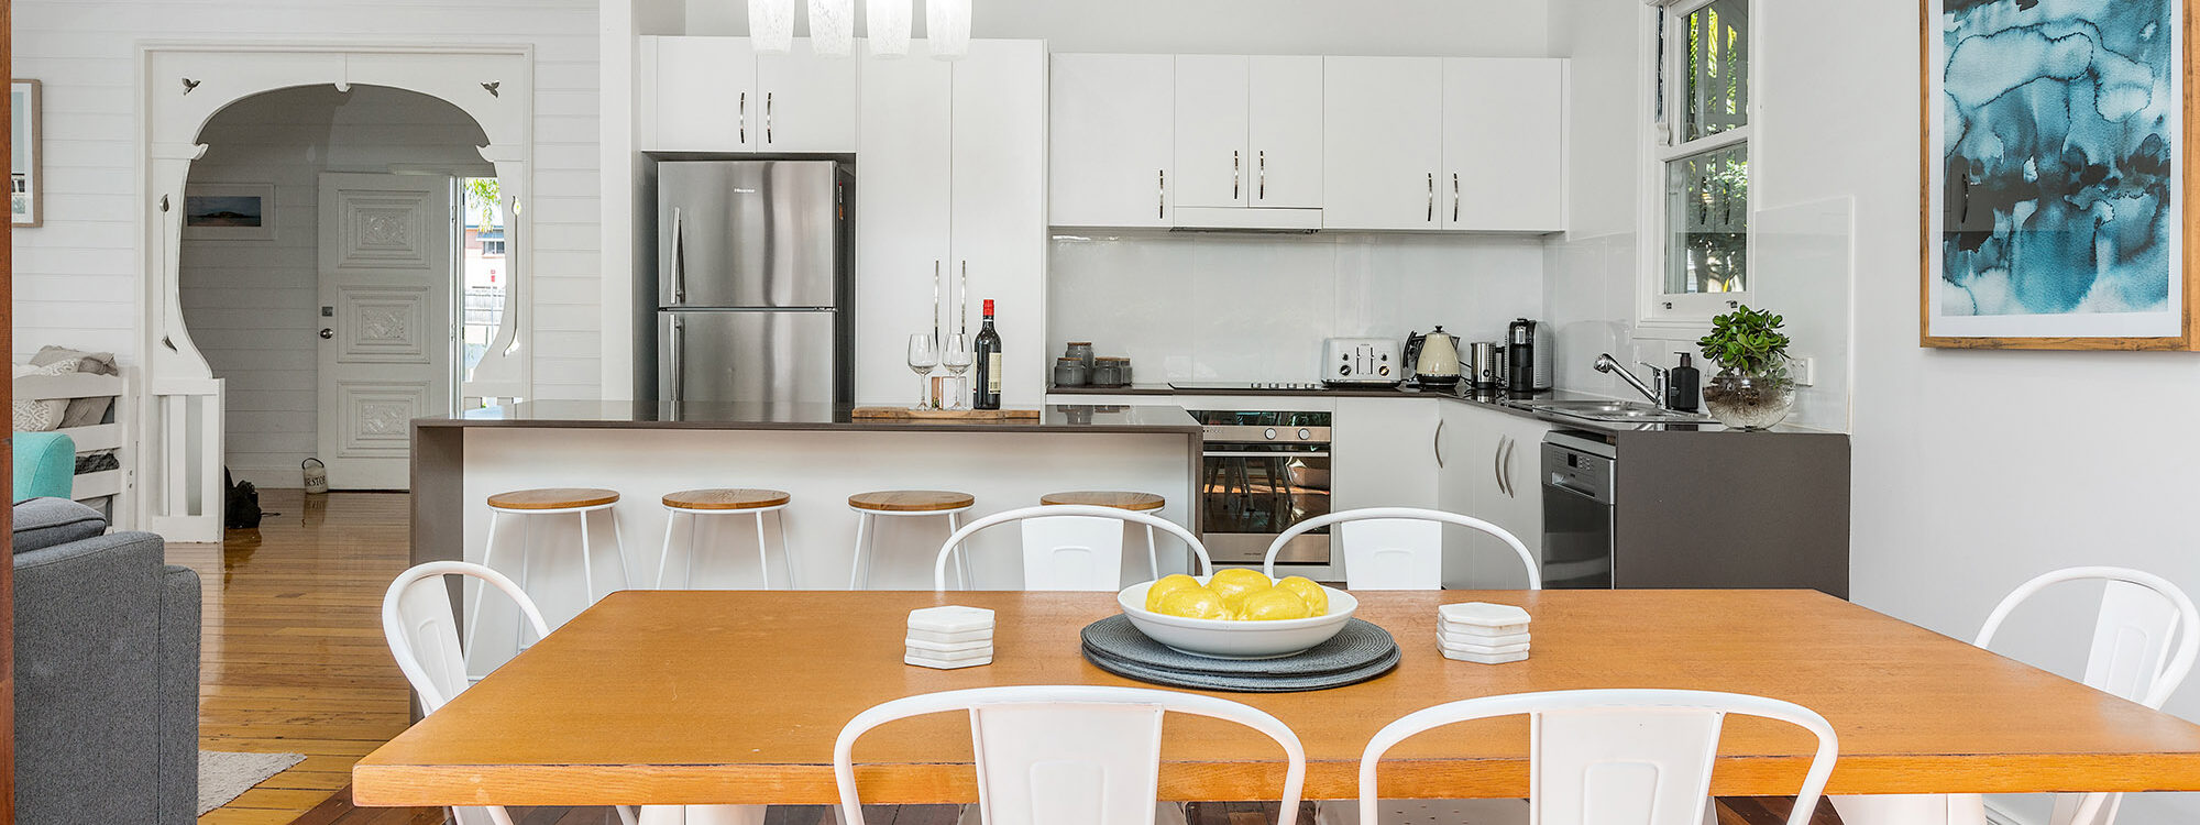 Aaloka Bay - Byron Bay - Kitchen and dining